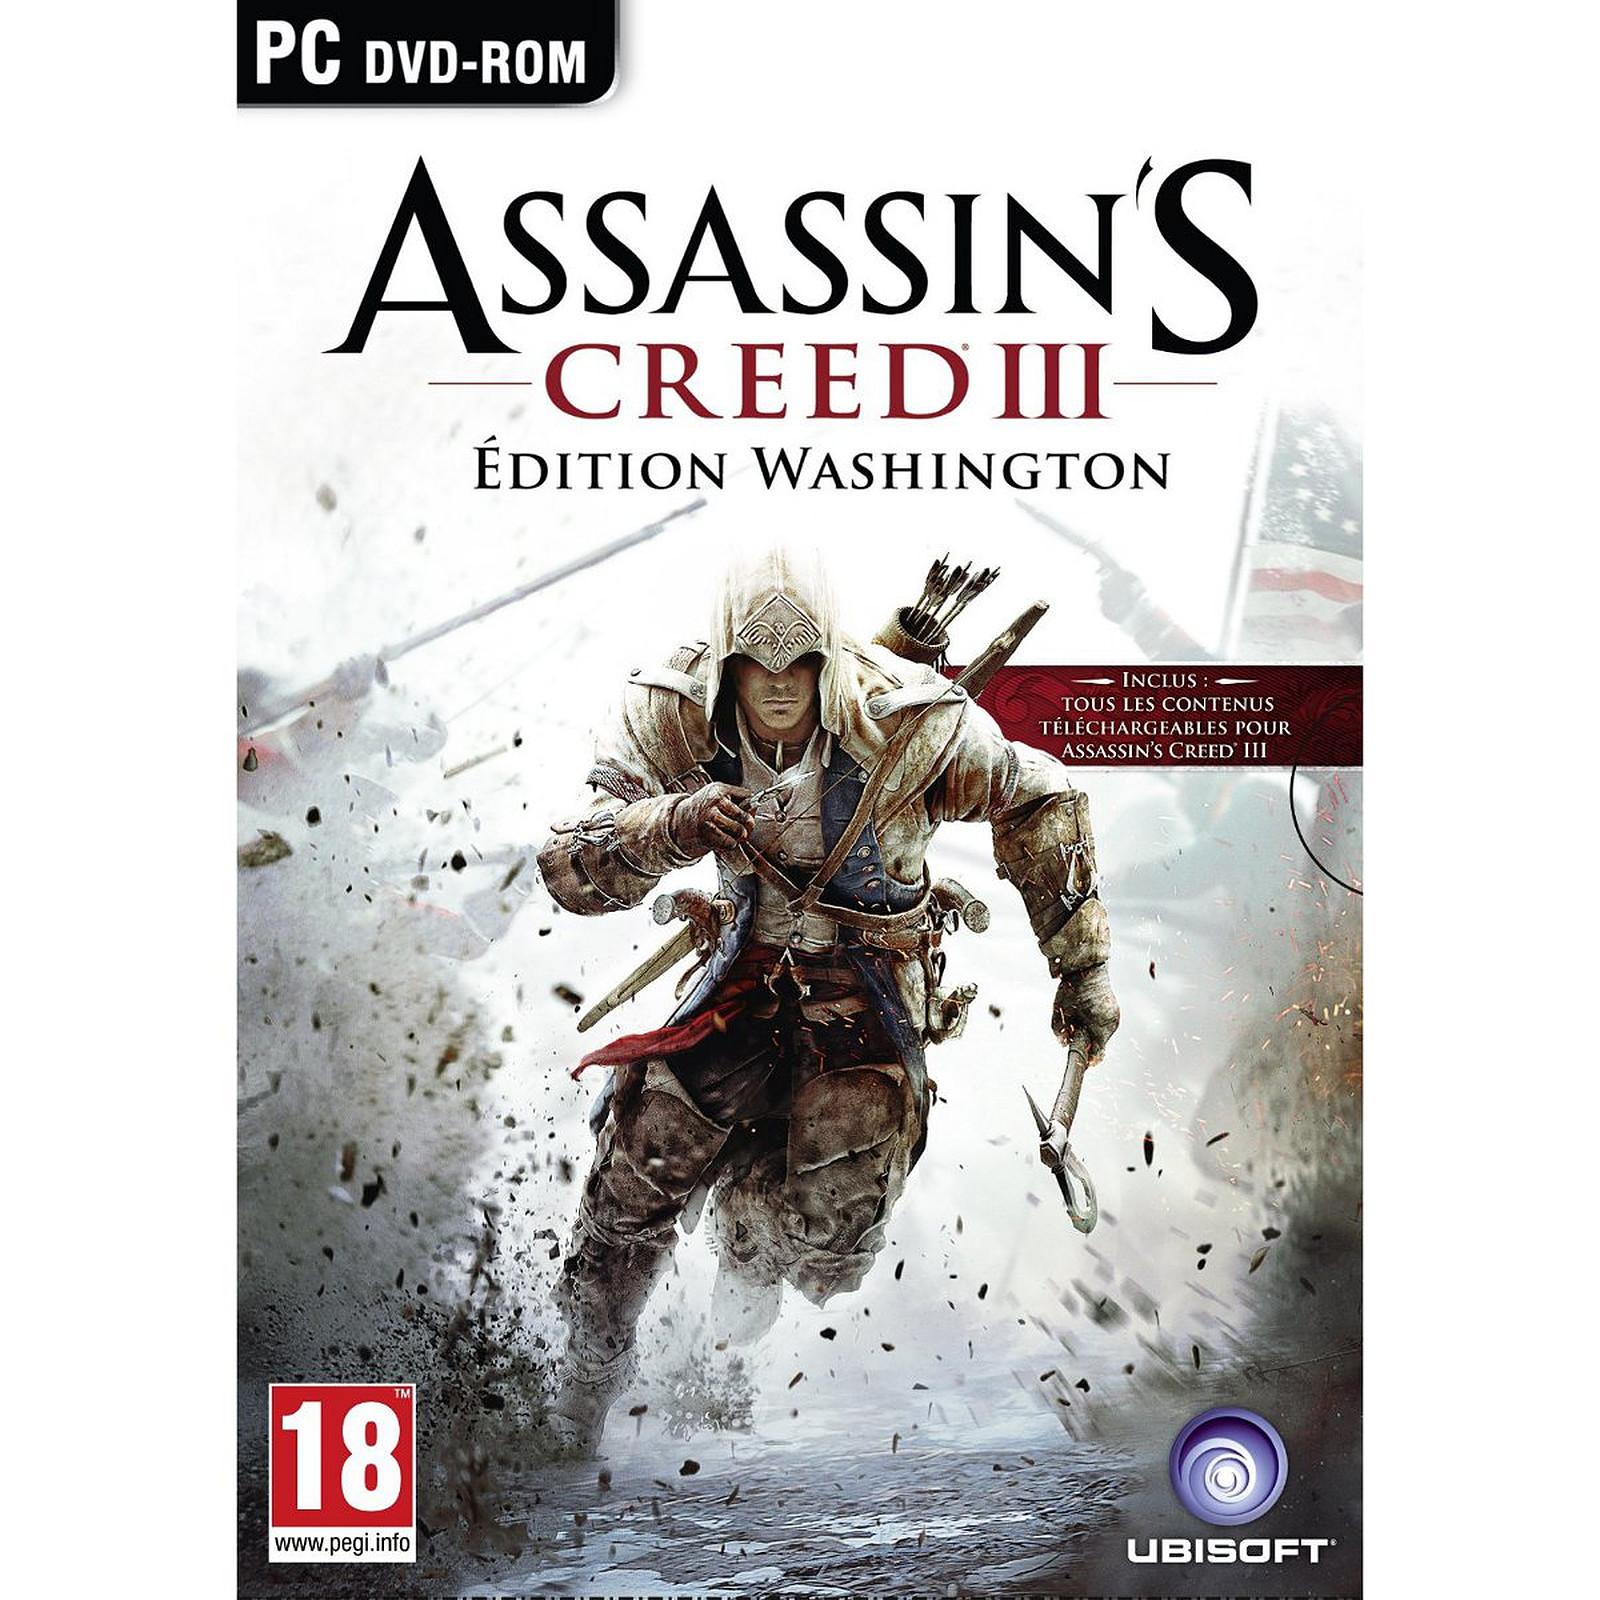 Assassin's Creed III - Édition Washington (PC)